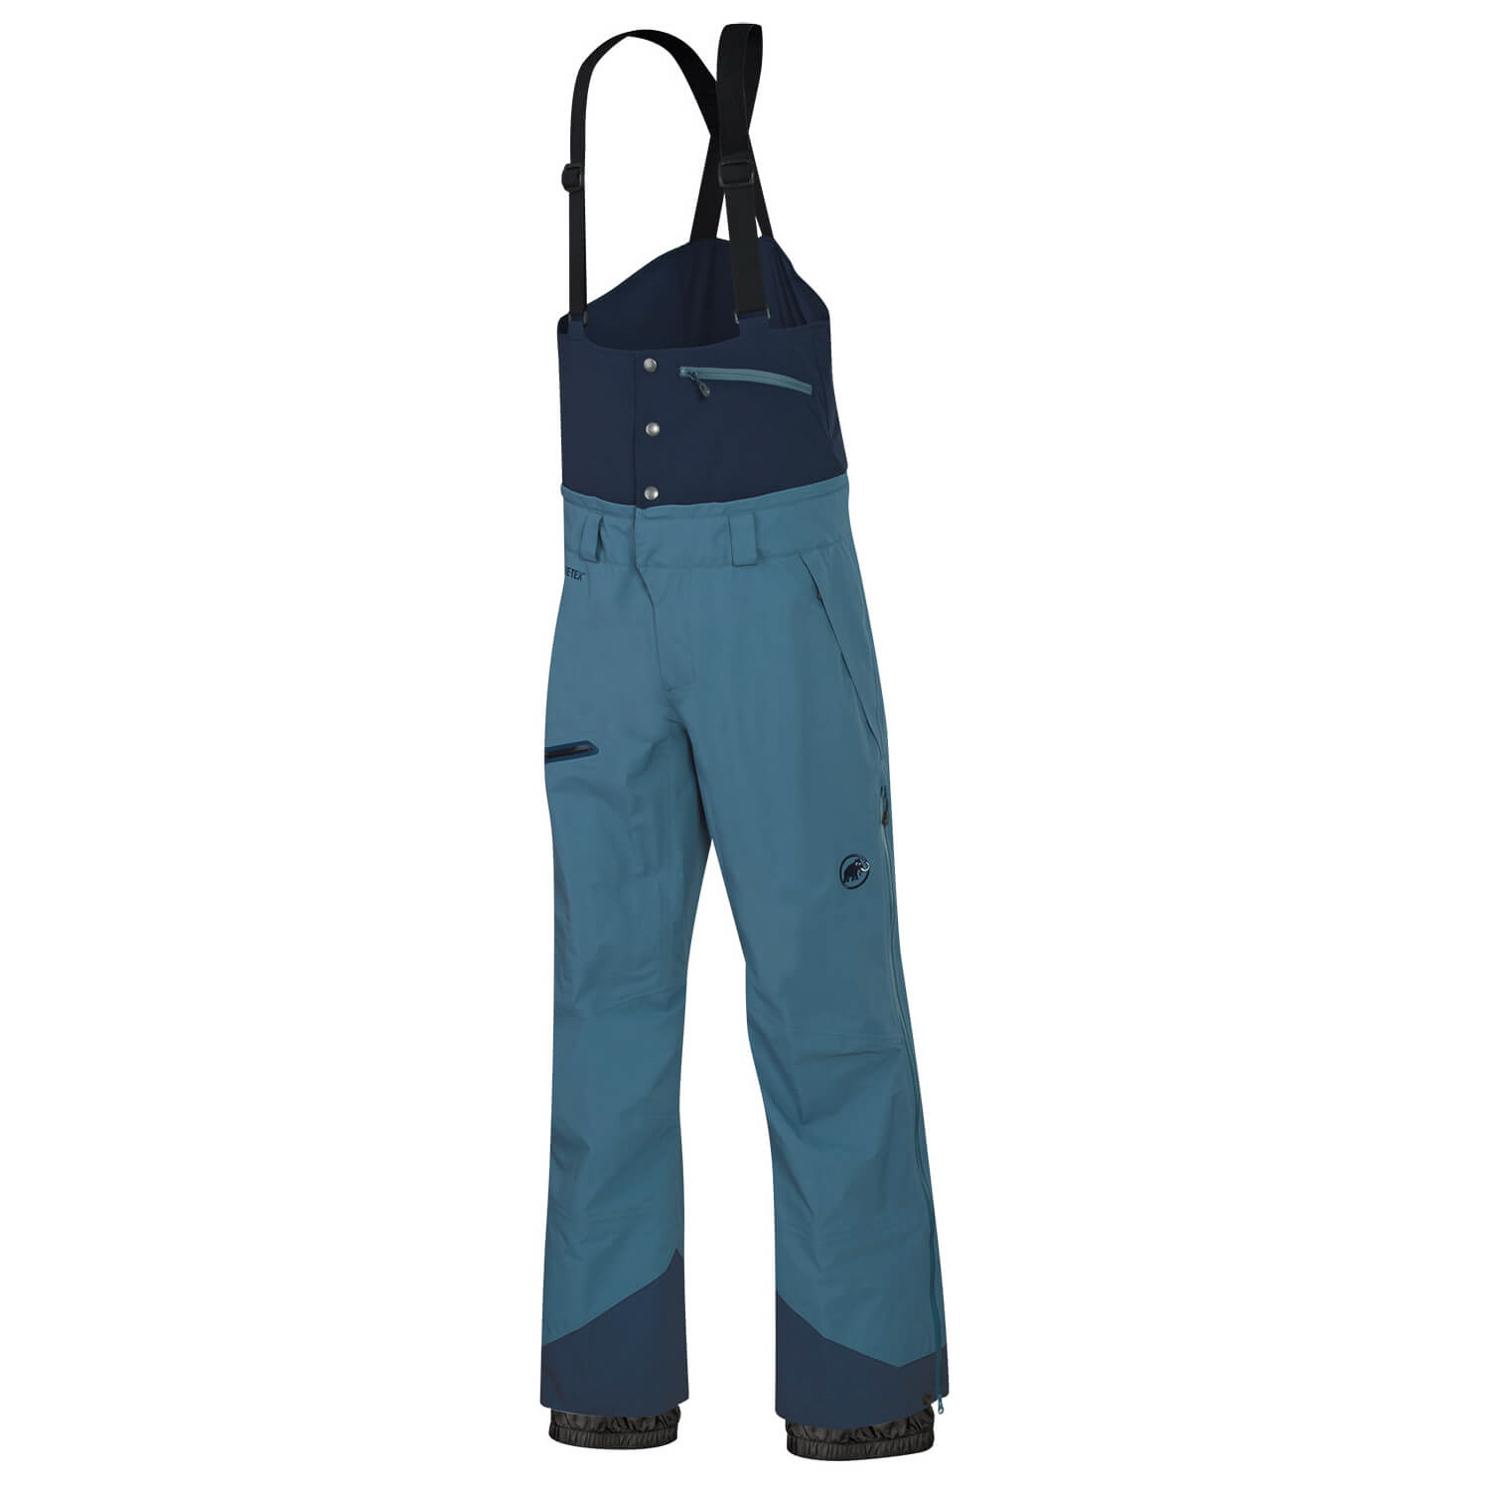 größte Auswahl neue Kollektion Neues Produkt Mammut - Alvier HS Pants - Skihose